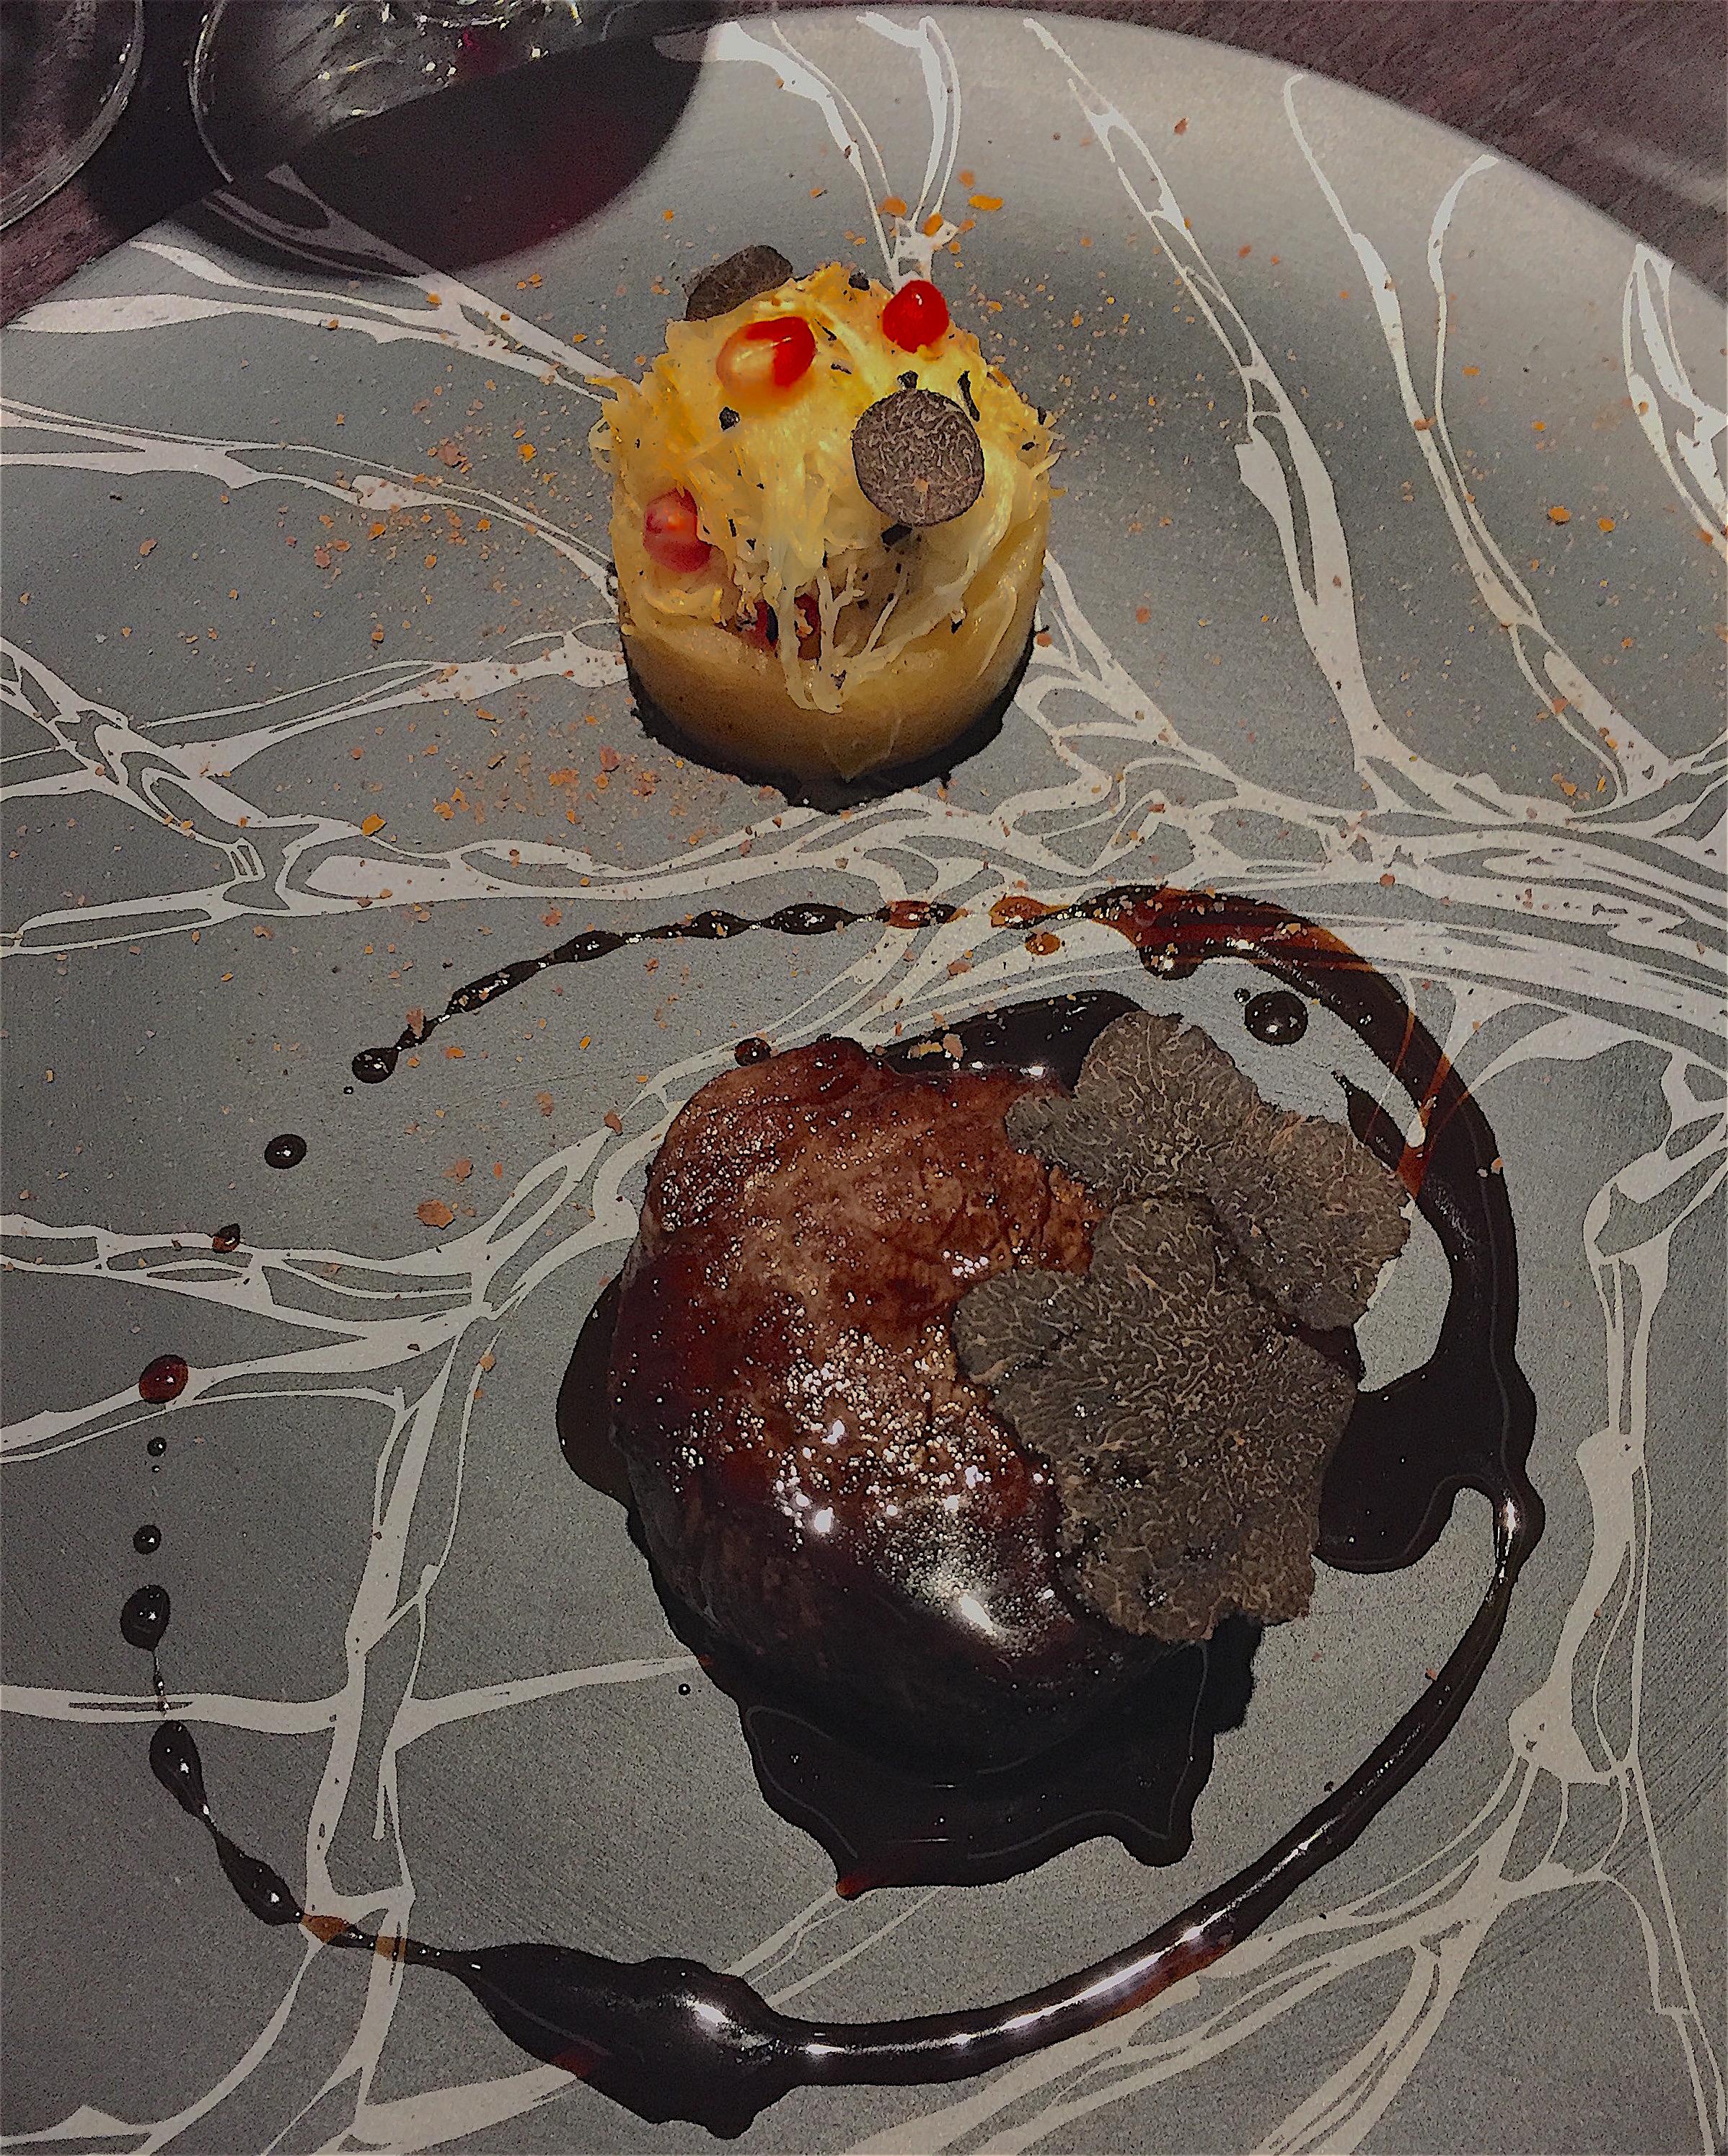 Restaurant Alain Geaam - beef filet, black truffles, pomegranate seeds @ Alexander Lobrano